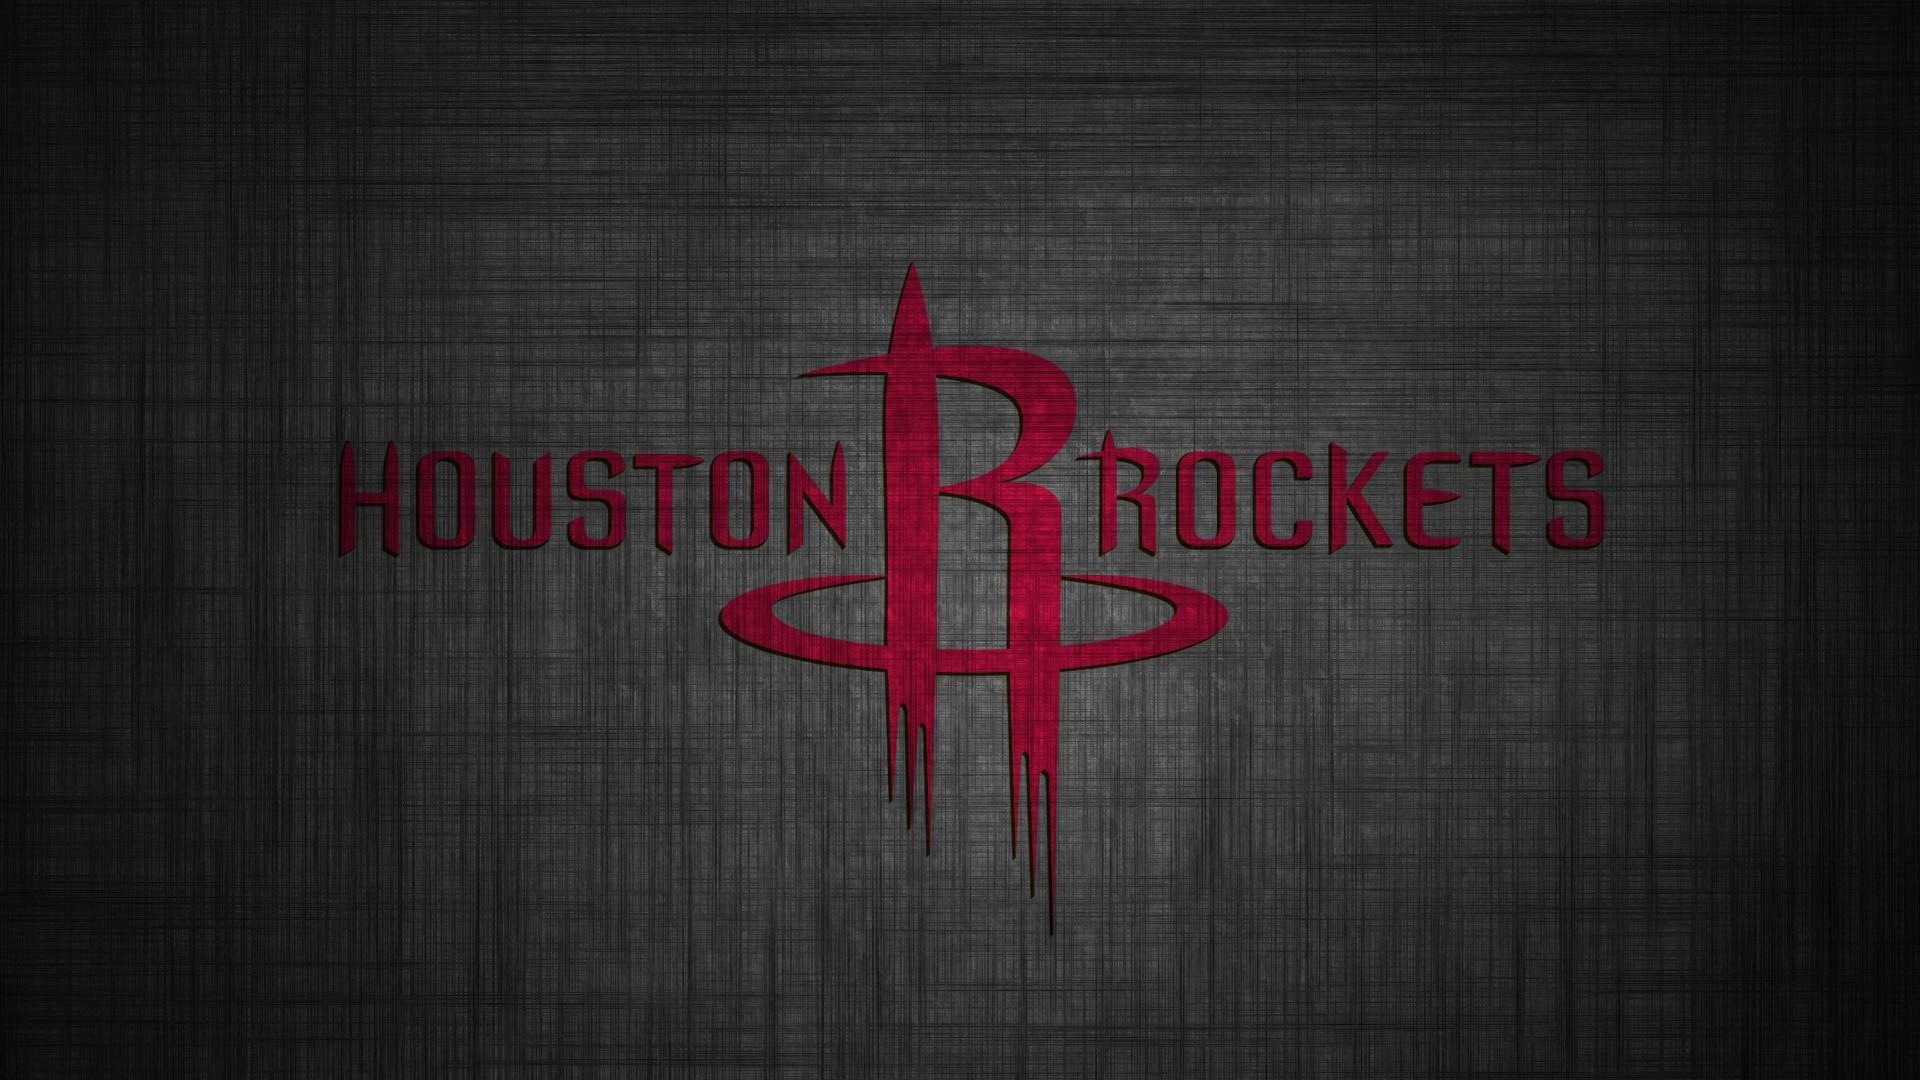 Houston Rockets Wallpapers – Wallpaper Cave   Free Wallpapers   Pinterest    Wallpaper